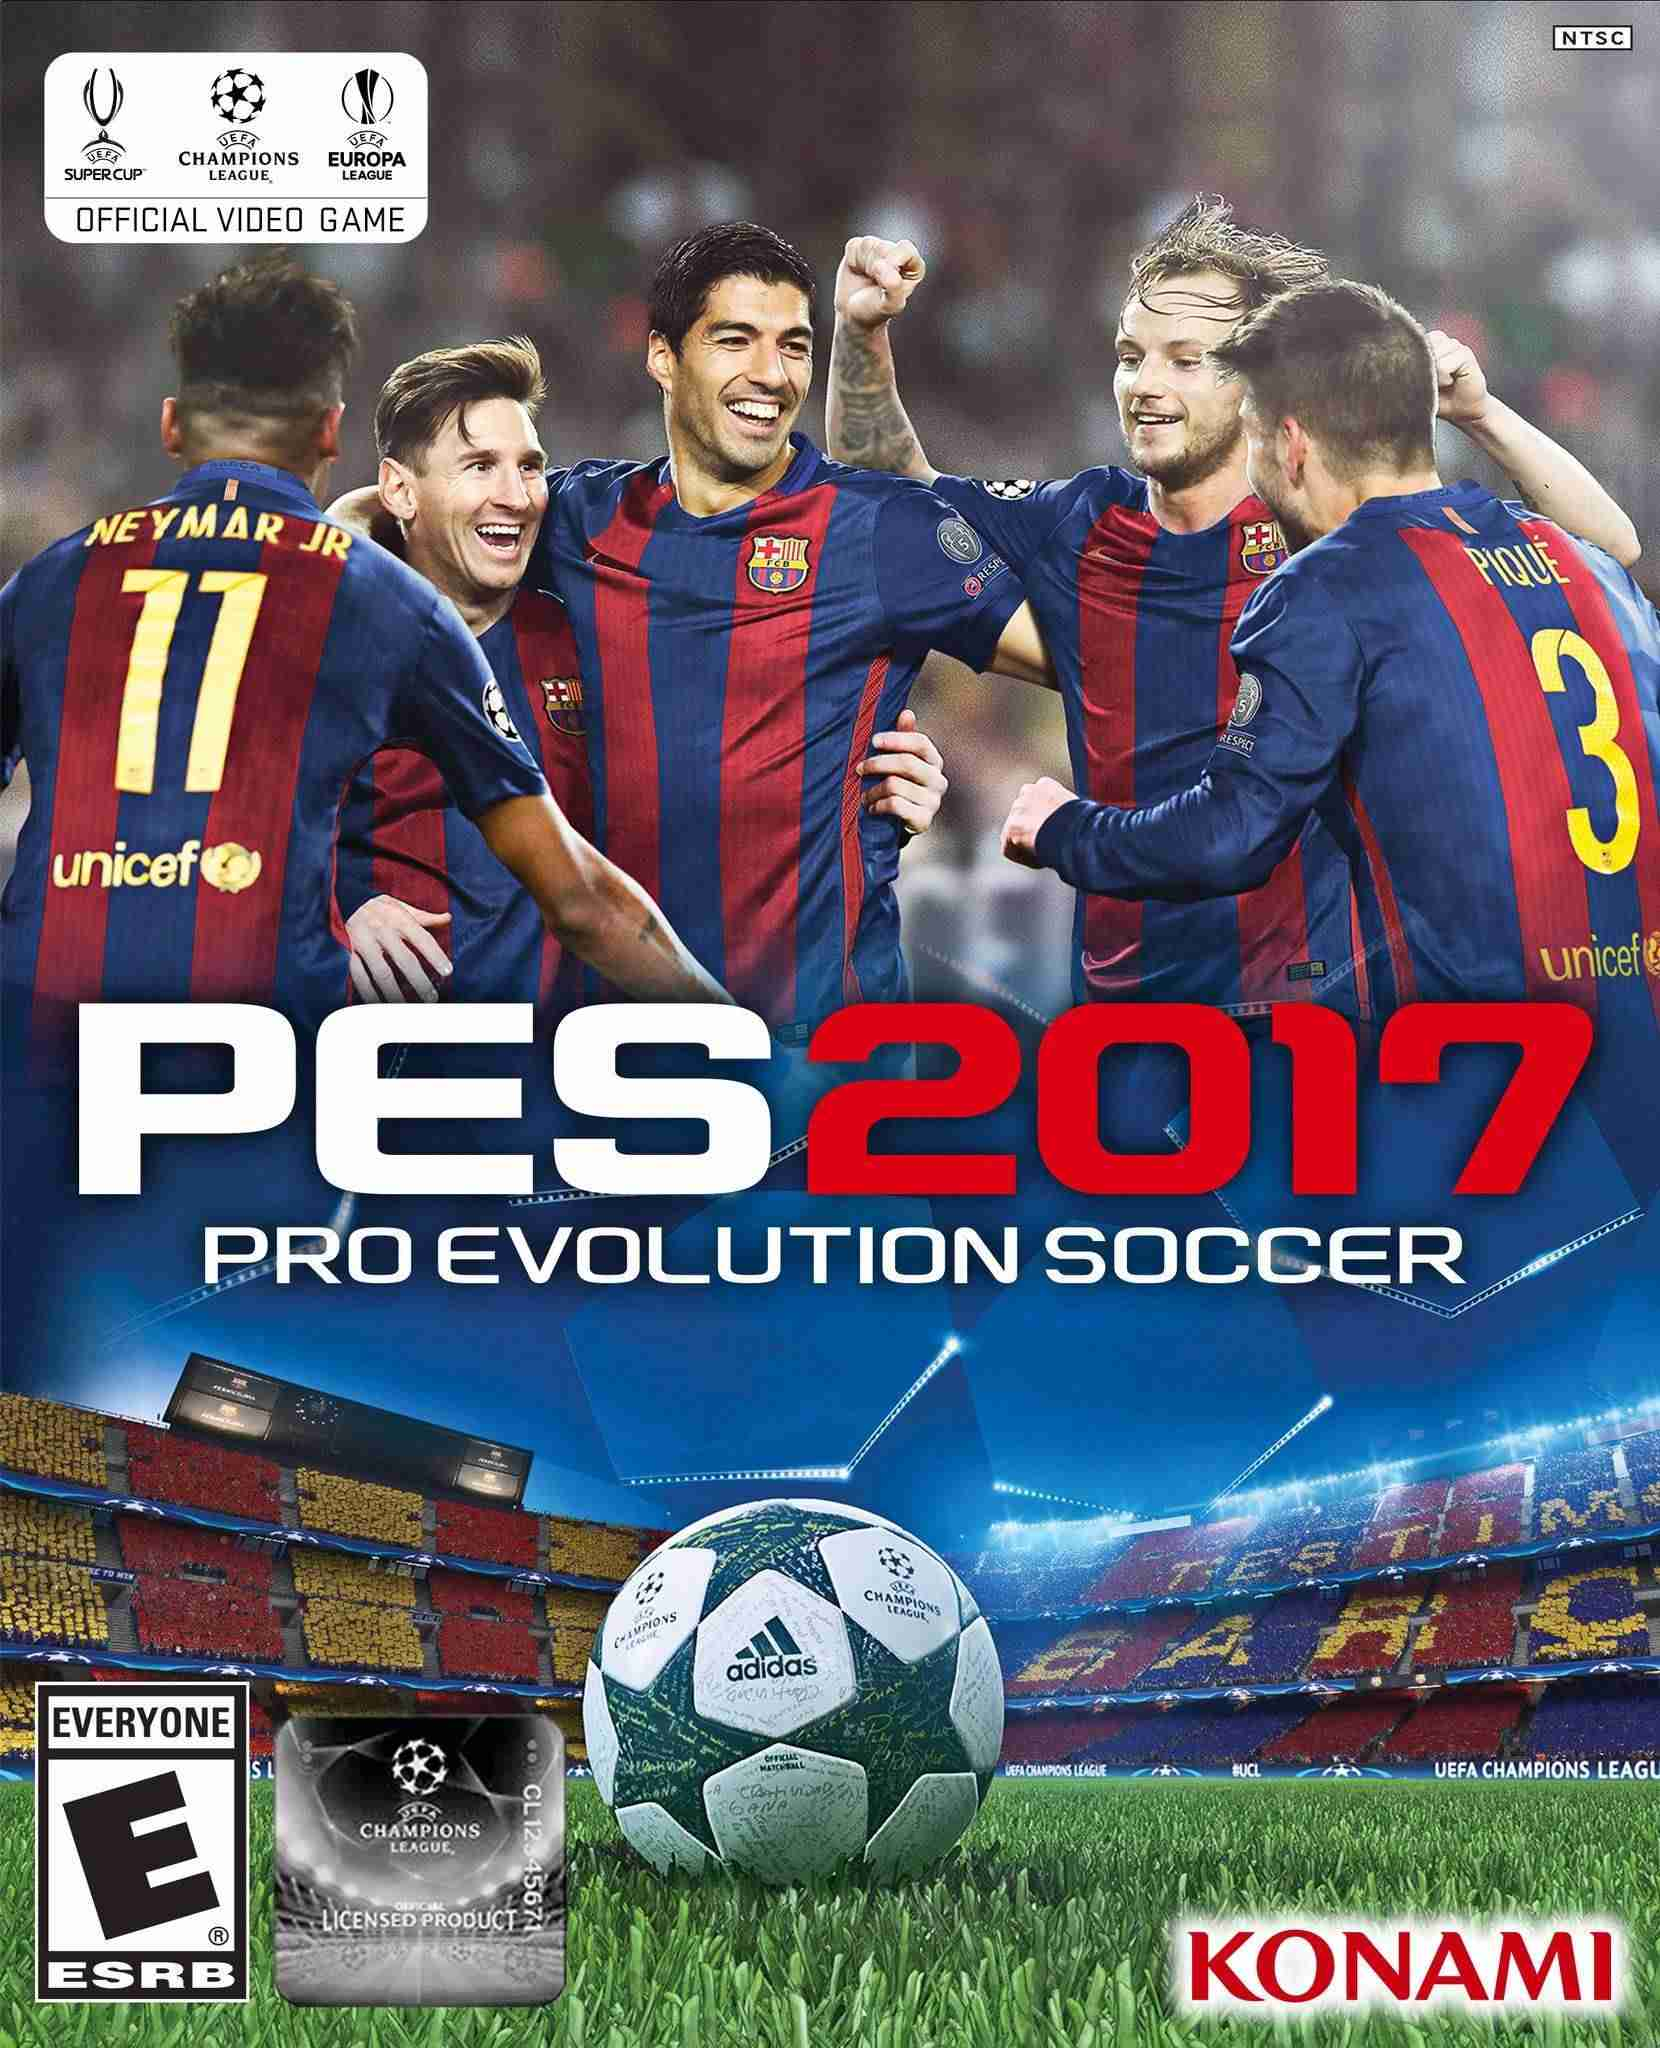 Descargar Pro Evolution Soccer 2017 [MULTI][DUPLEX] por Torrent